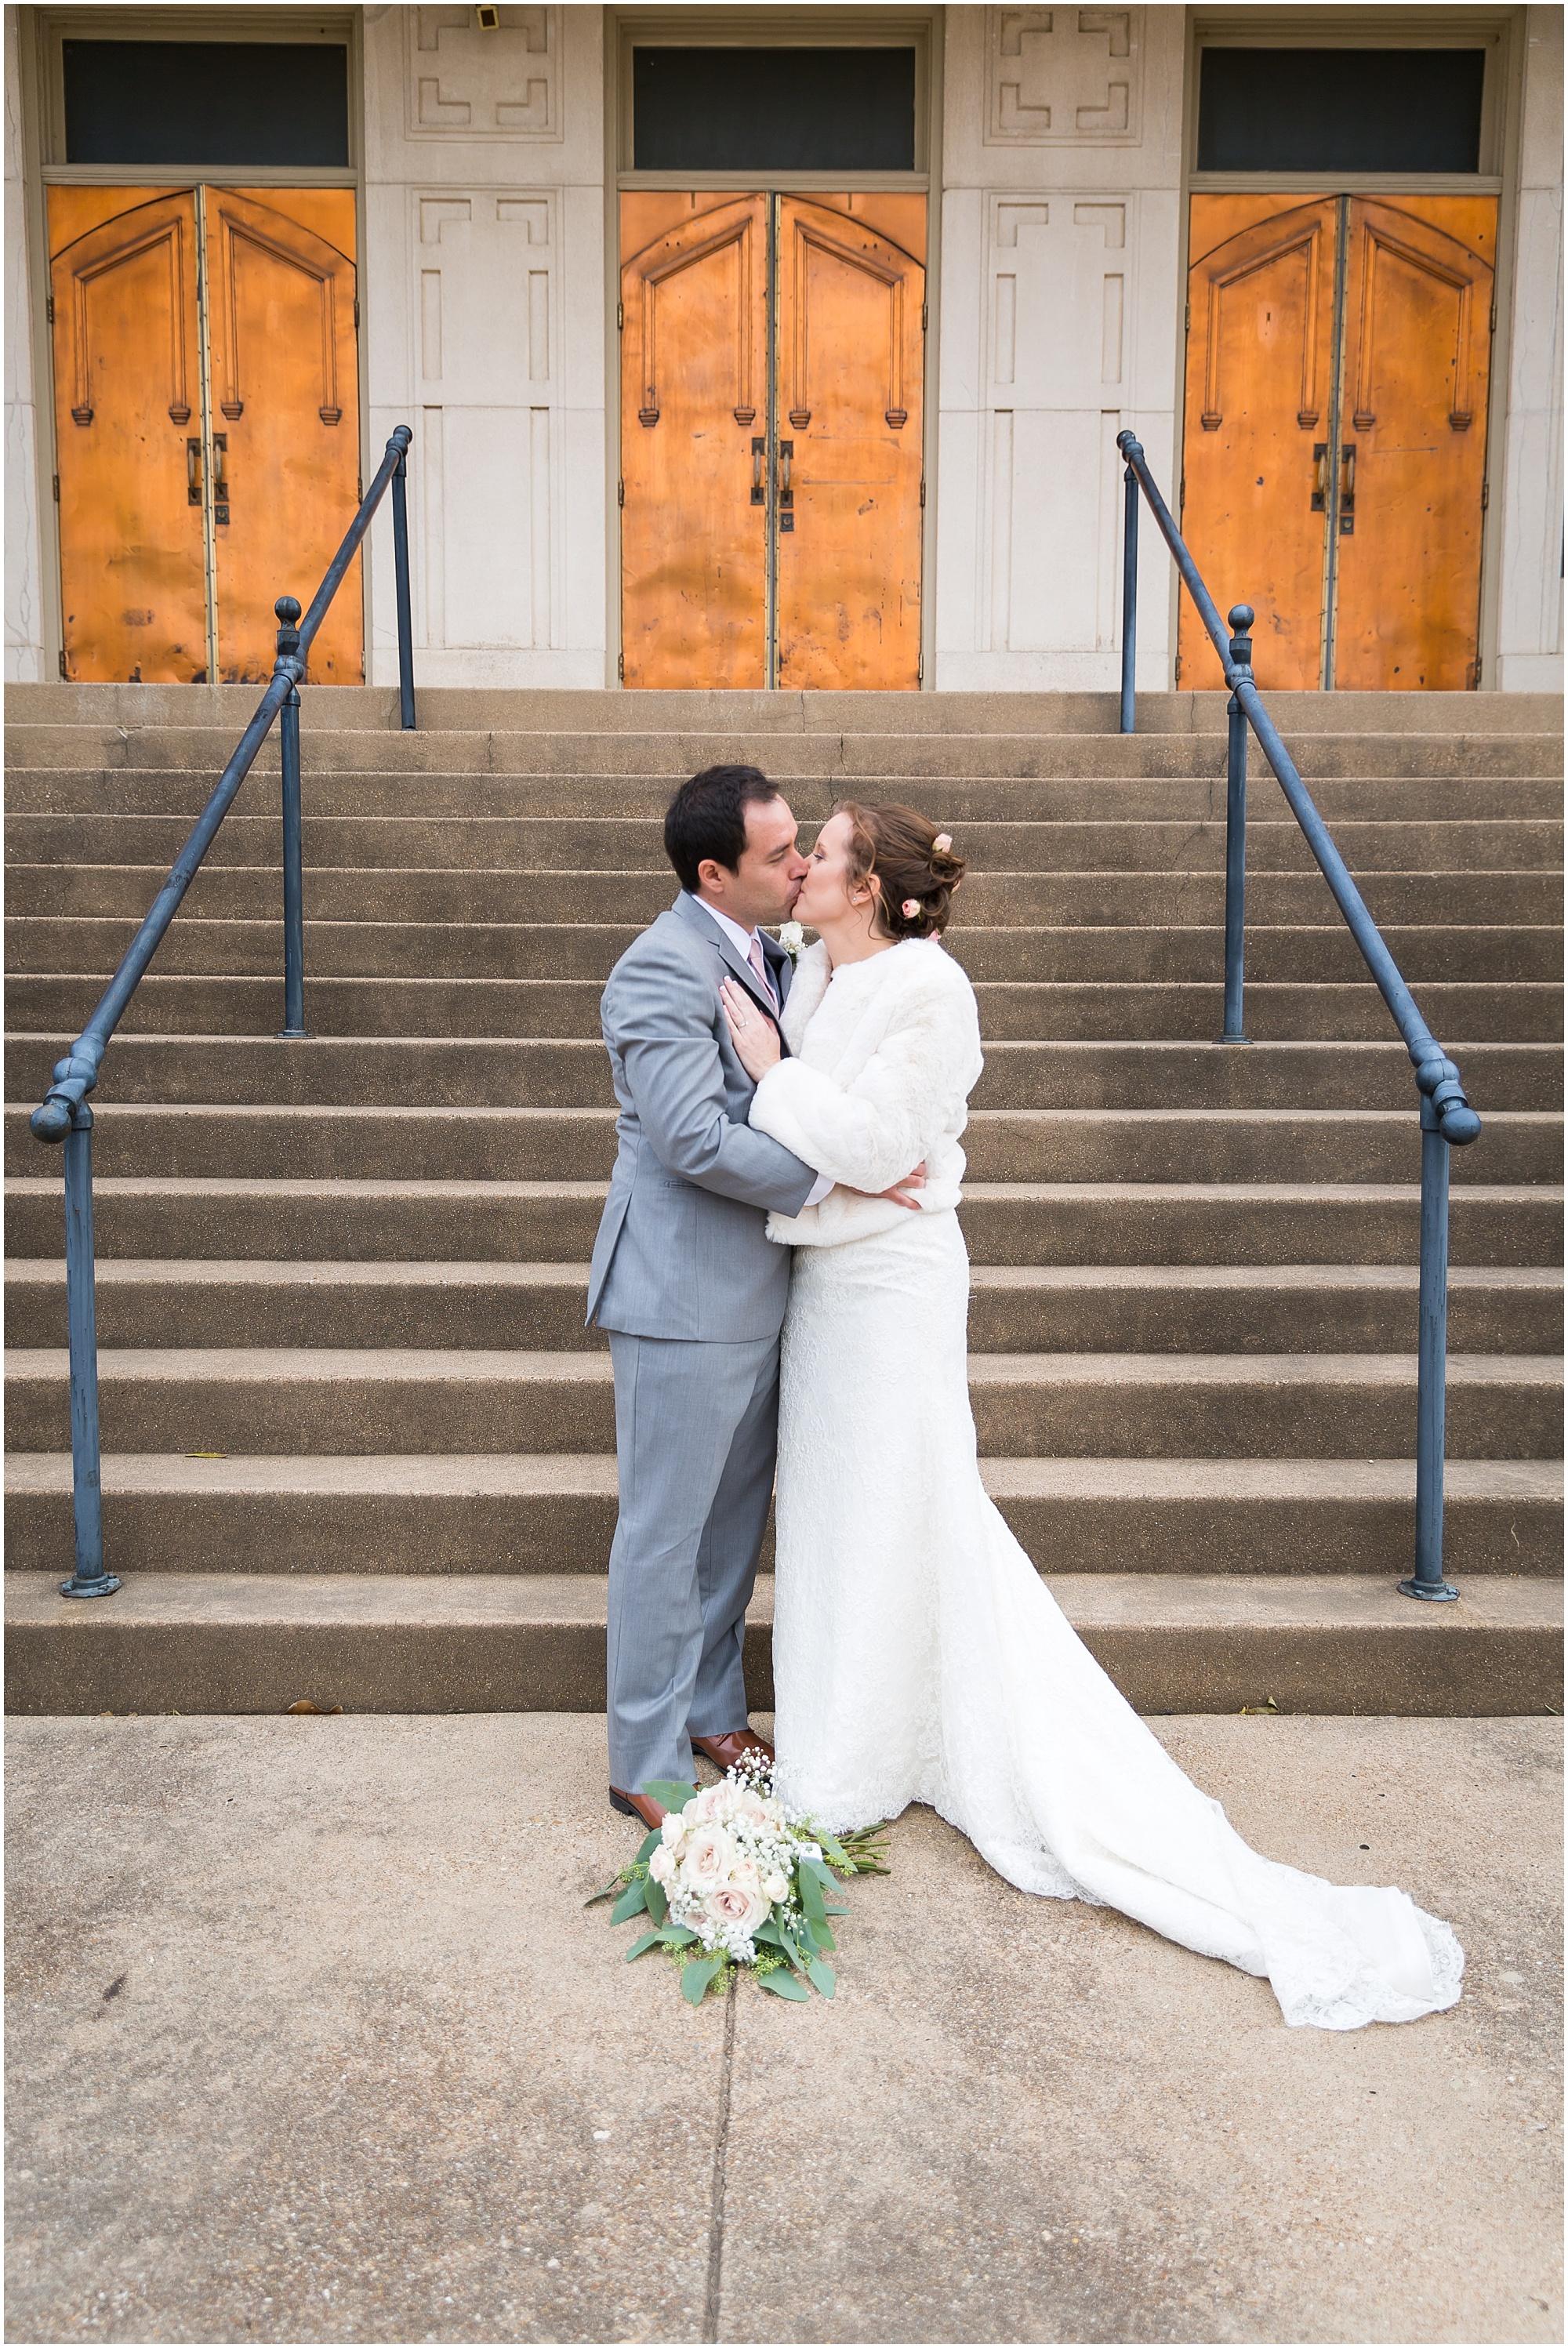 Bride and groom kiss in front of the doors at The Chapel at Meyer Center in Waco, Texas - Jason & Melaina Photography - www.jasonandmelaina.com